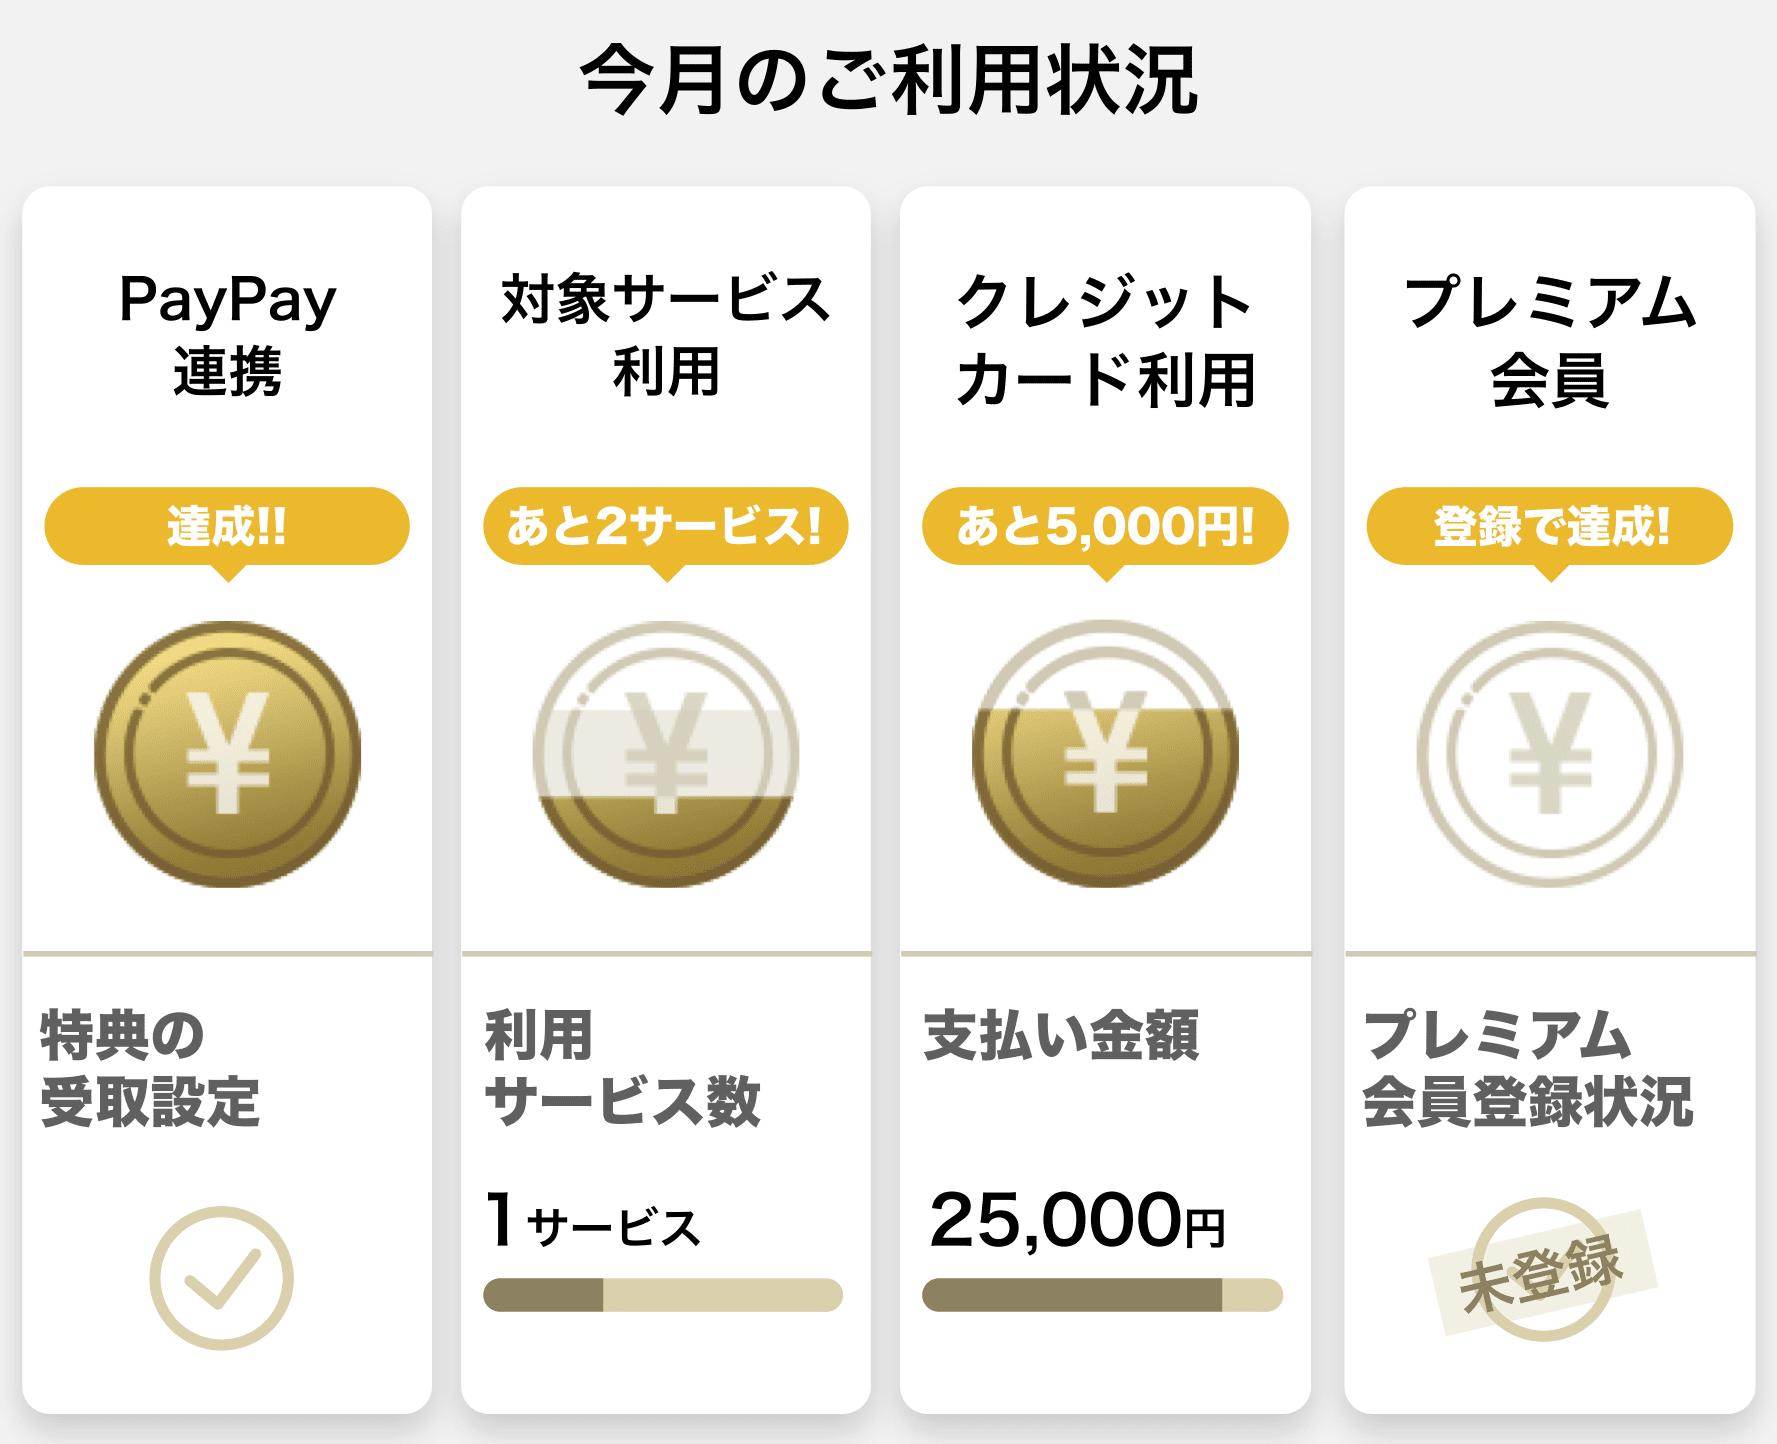 PayPaySTEPが拡充へ。Yahoo!ショッピング、PayPayモールが多少お得に。10/1~。